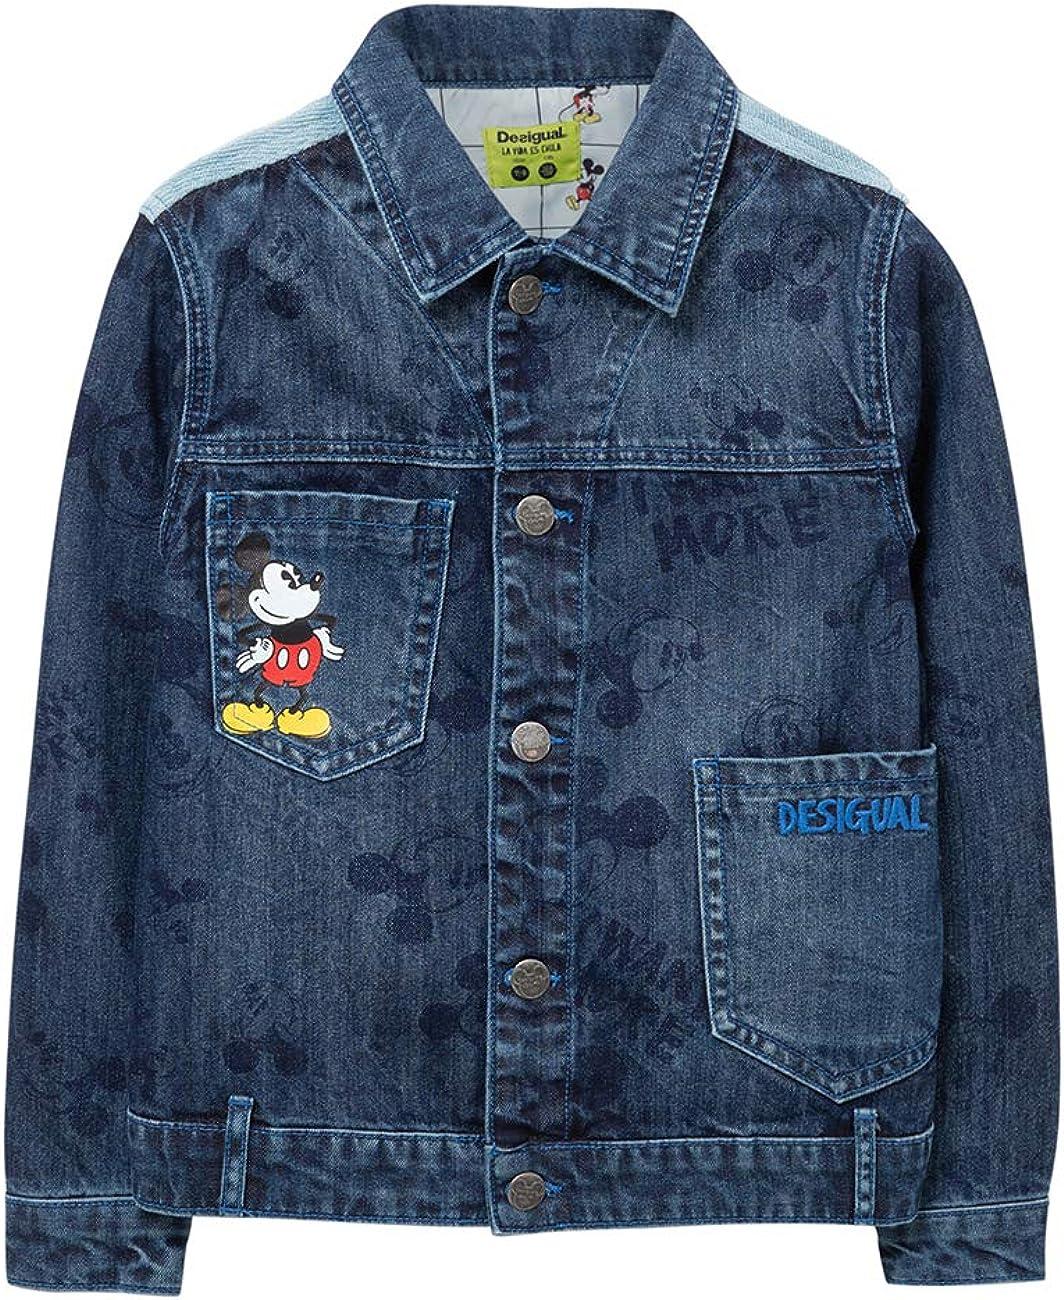 Desigual Girls Jacket Mickey